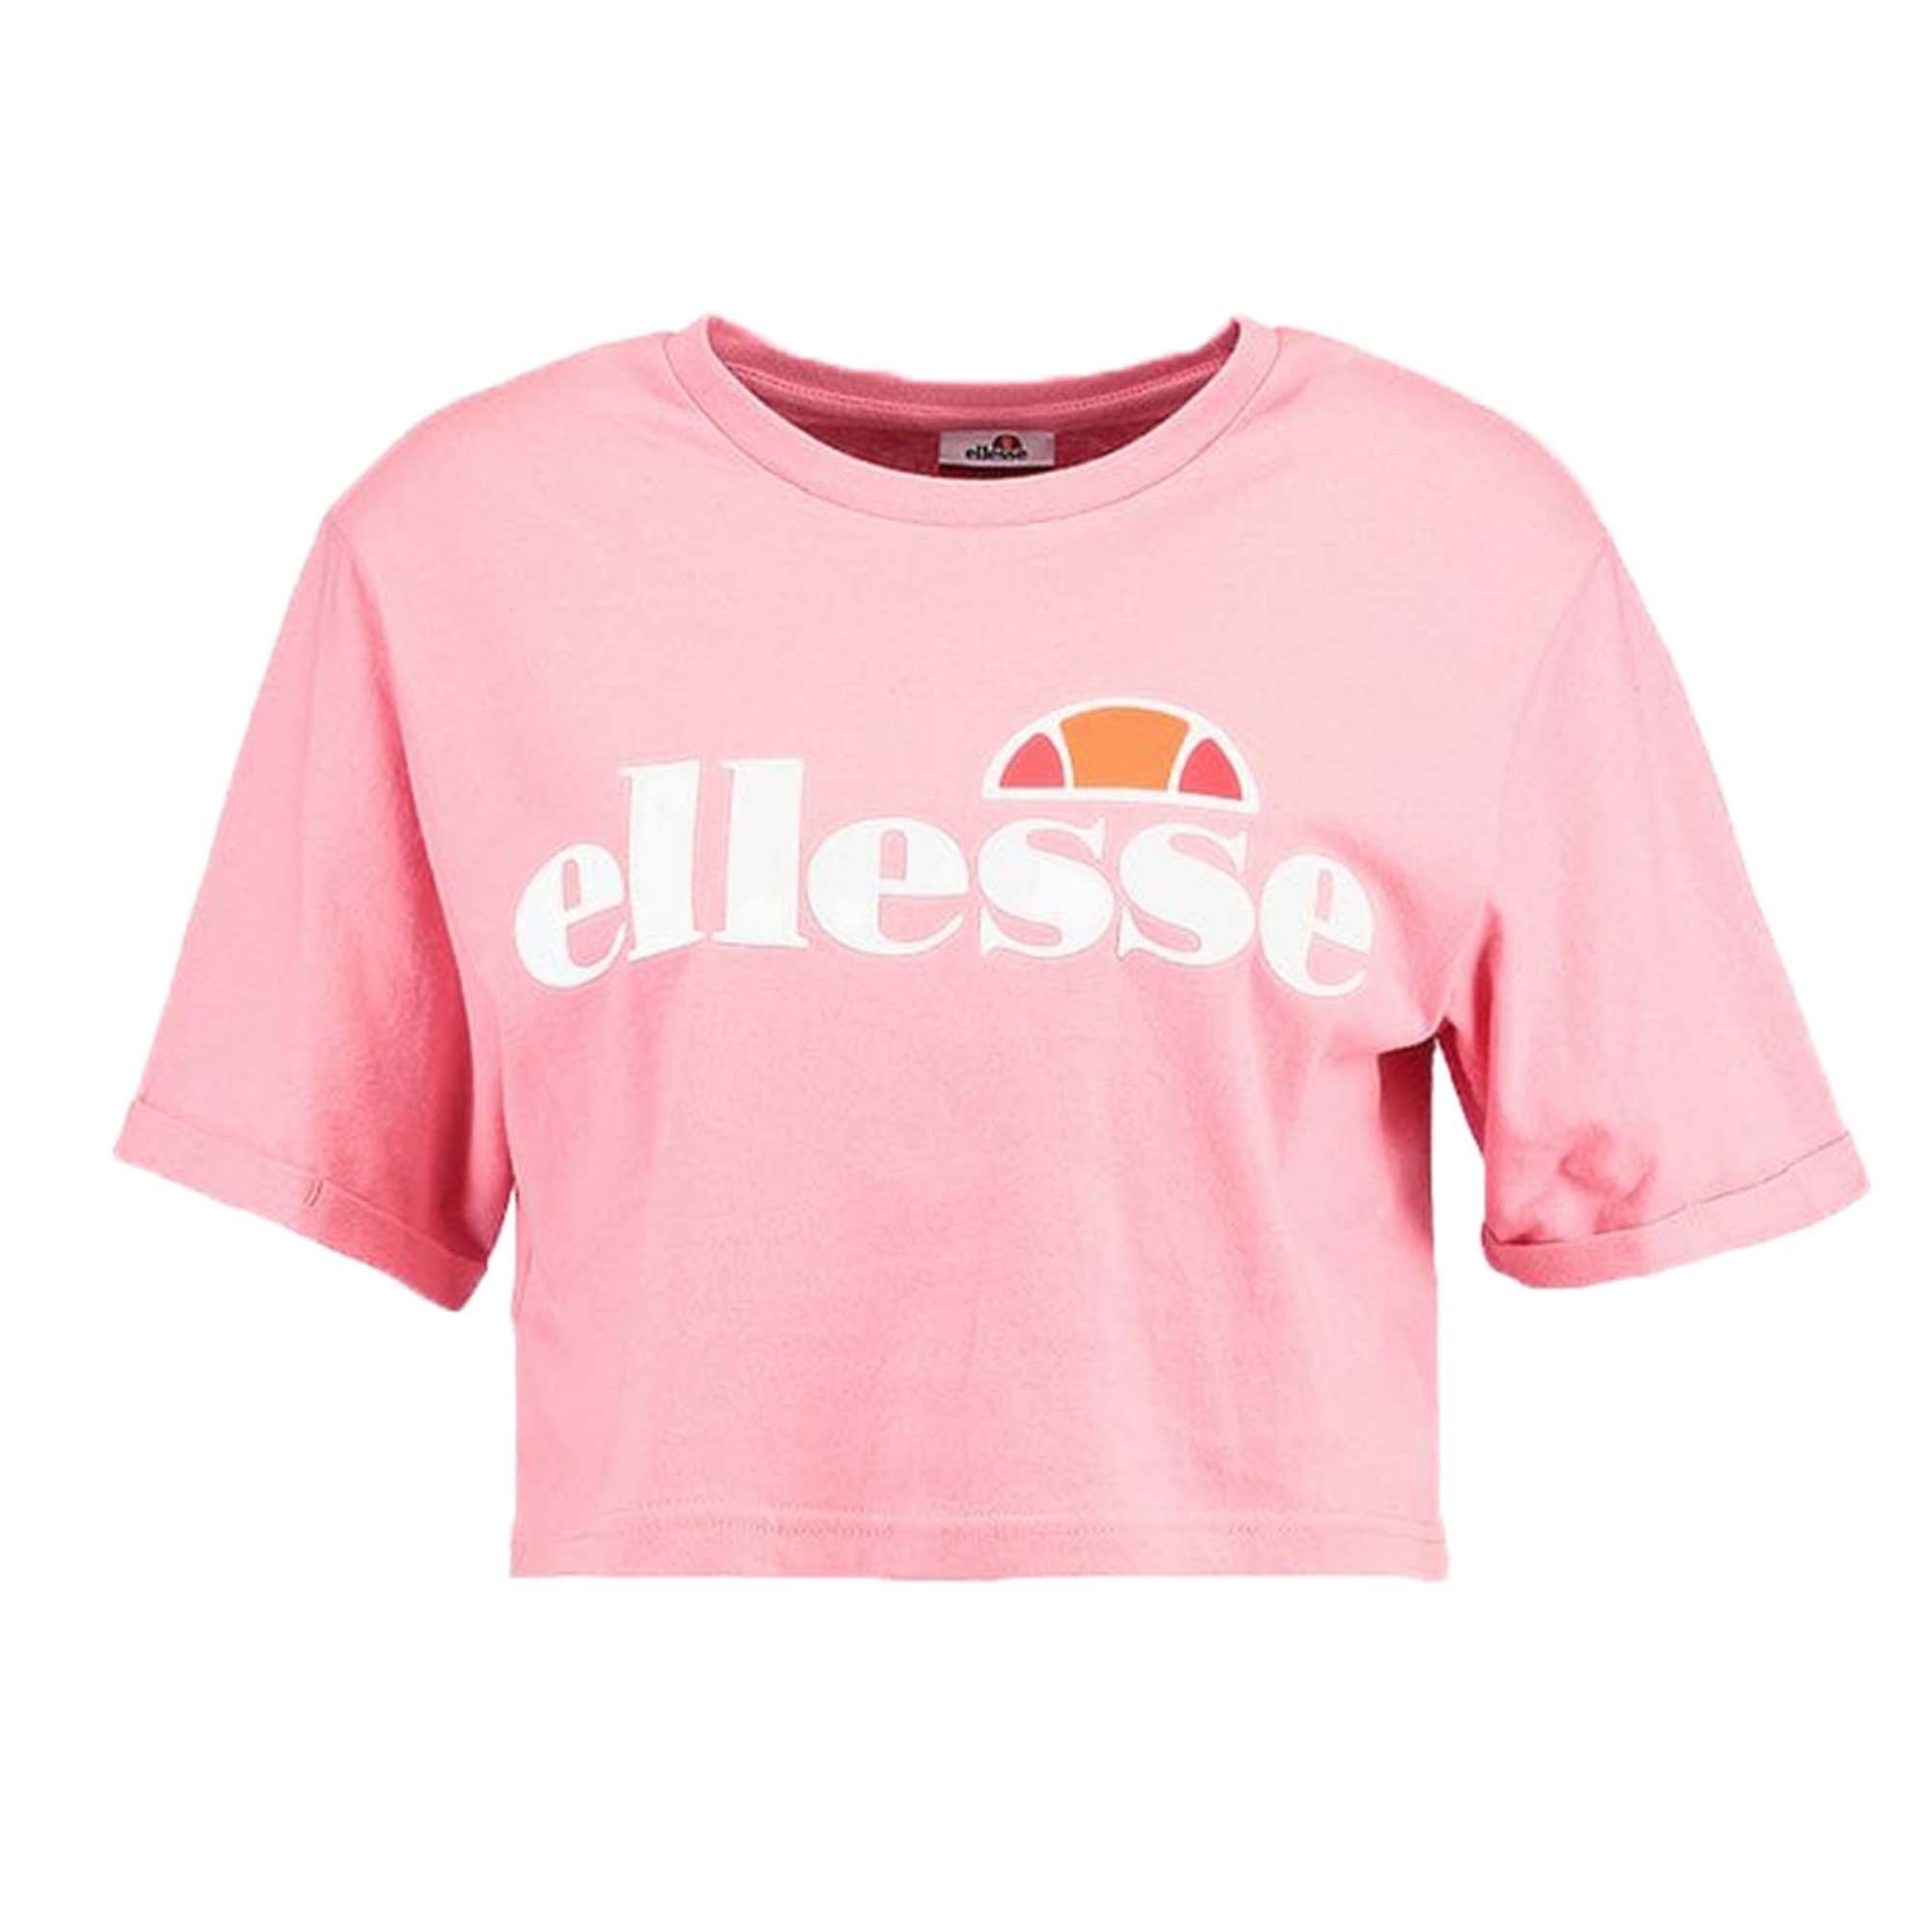 Ellesse Heritage Alberta Womens Ladies Crop Top T-Shirt Shirt Light Pink